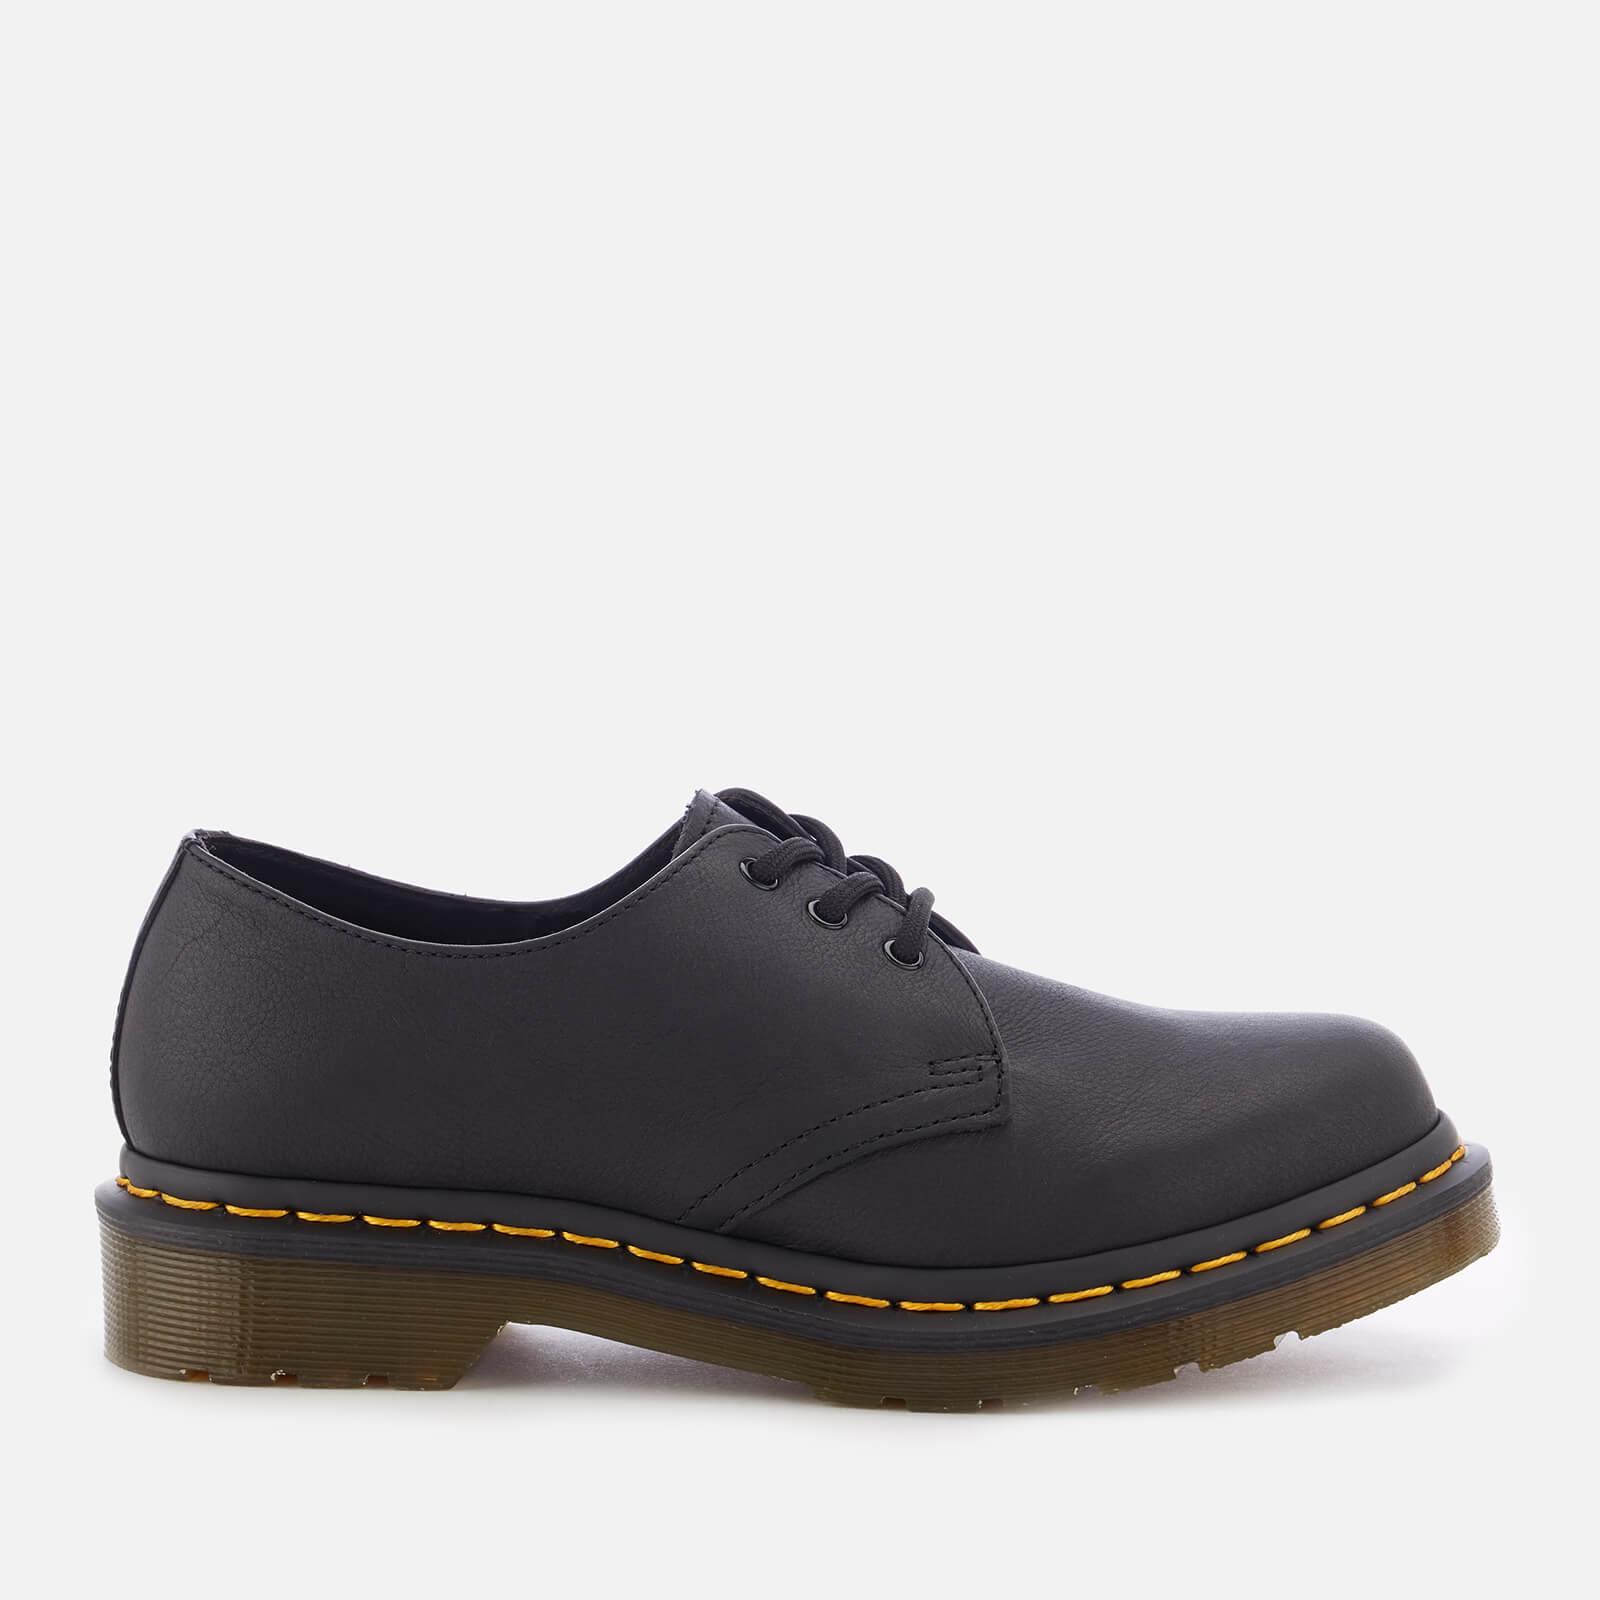 Dr. Martens Women's 1461 W Virginia Leather 3-Eye Shoes - Black - UK 5 - Black